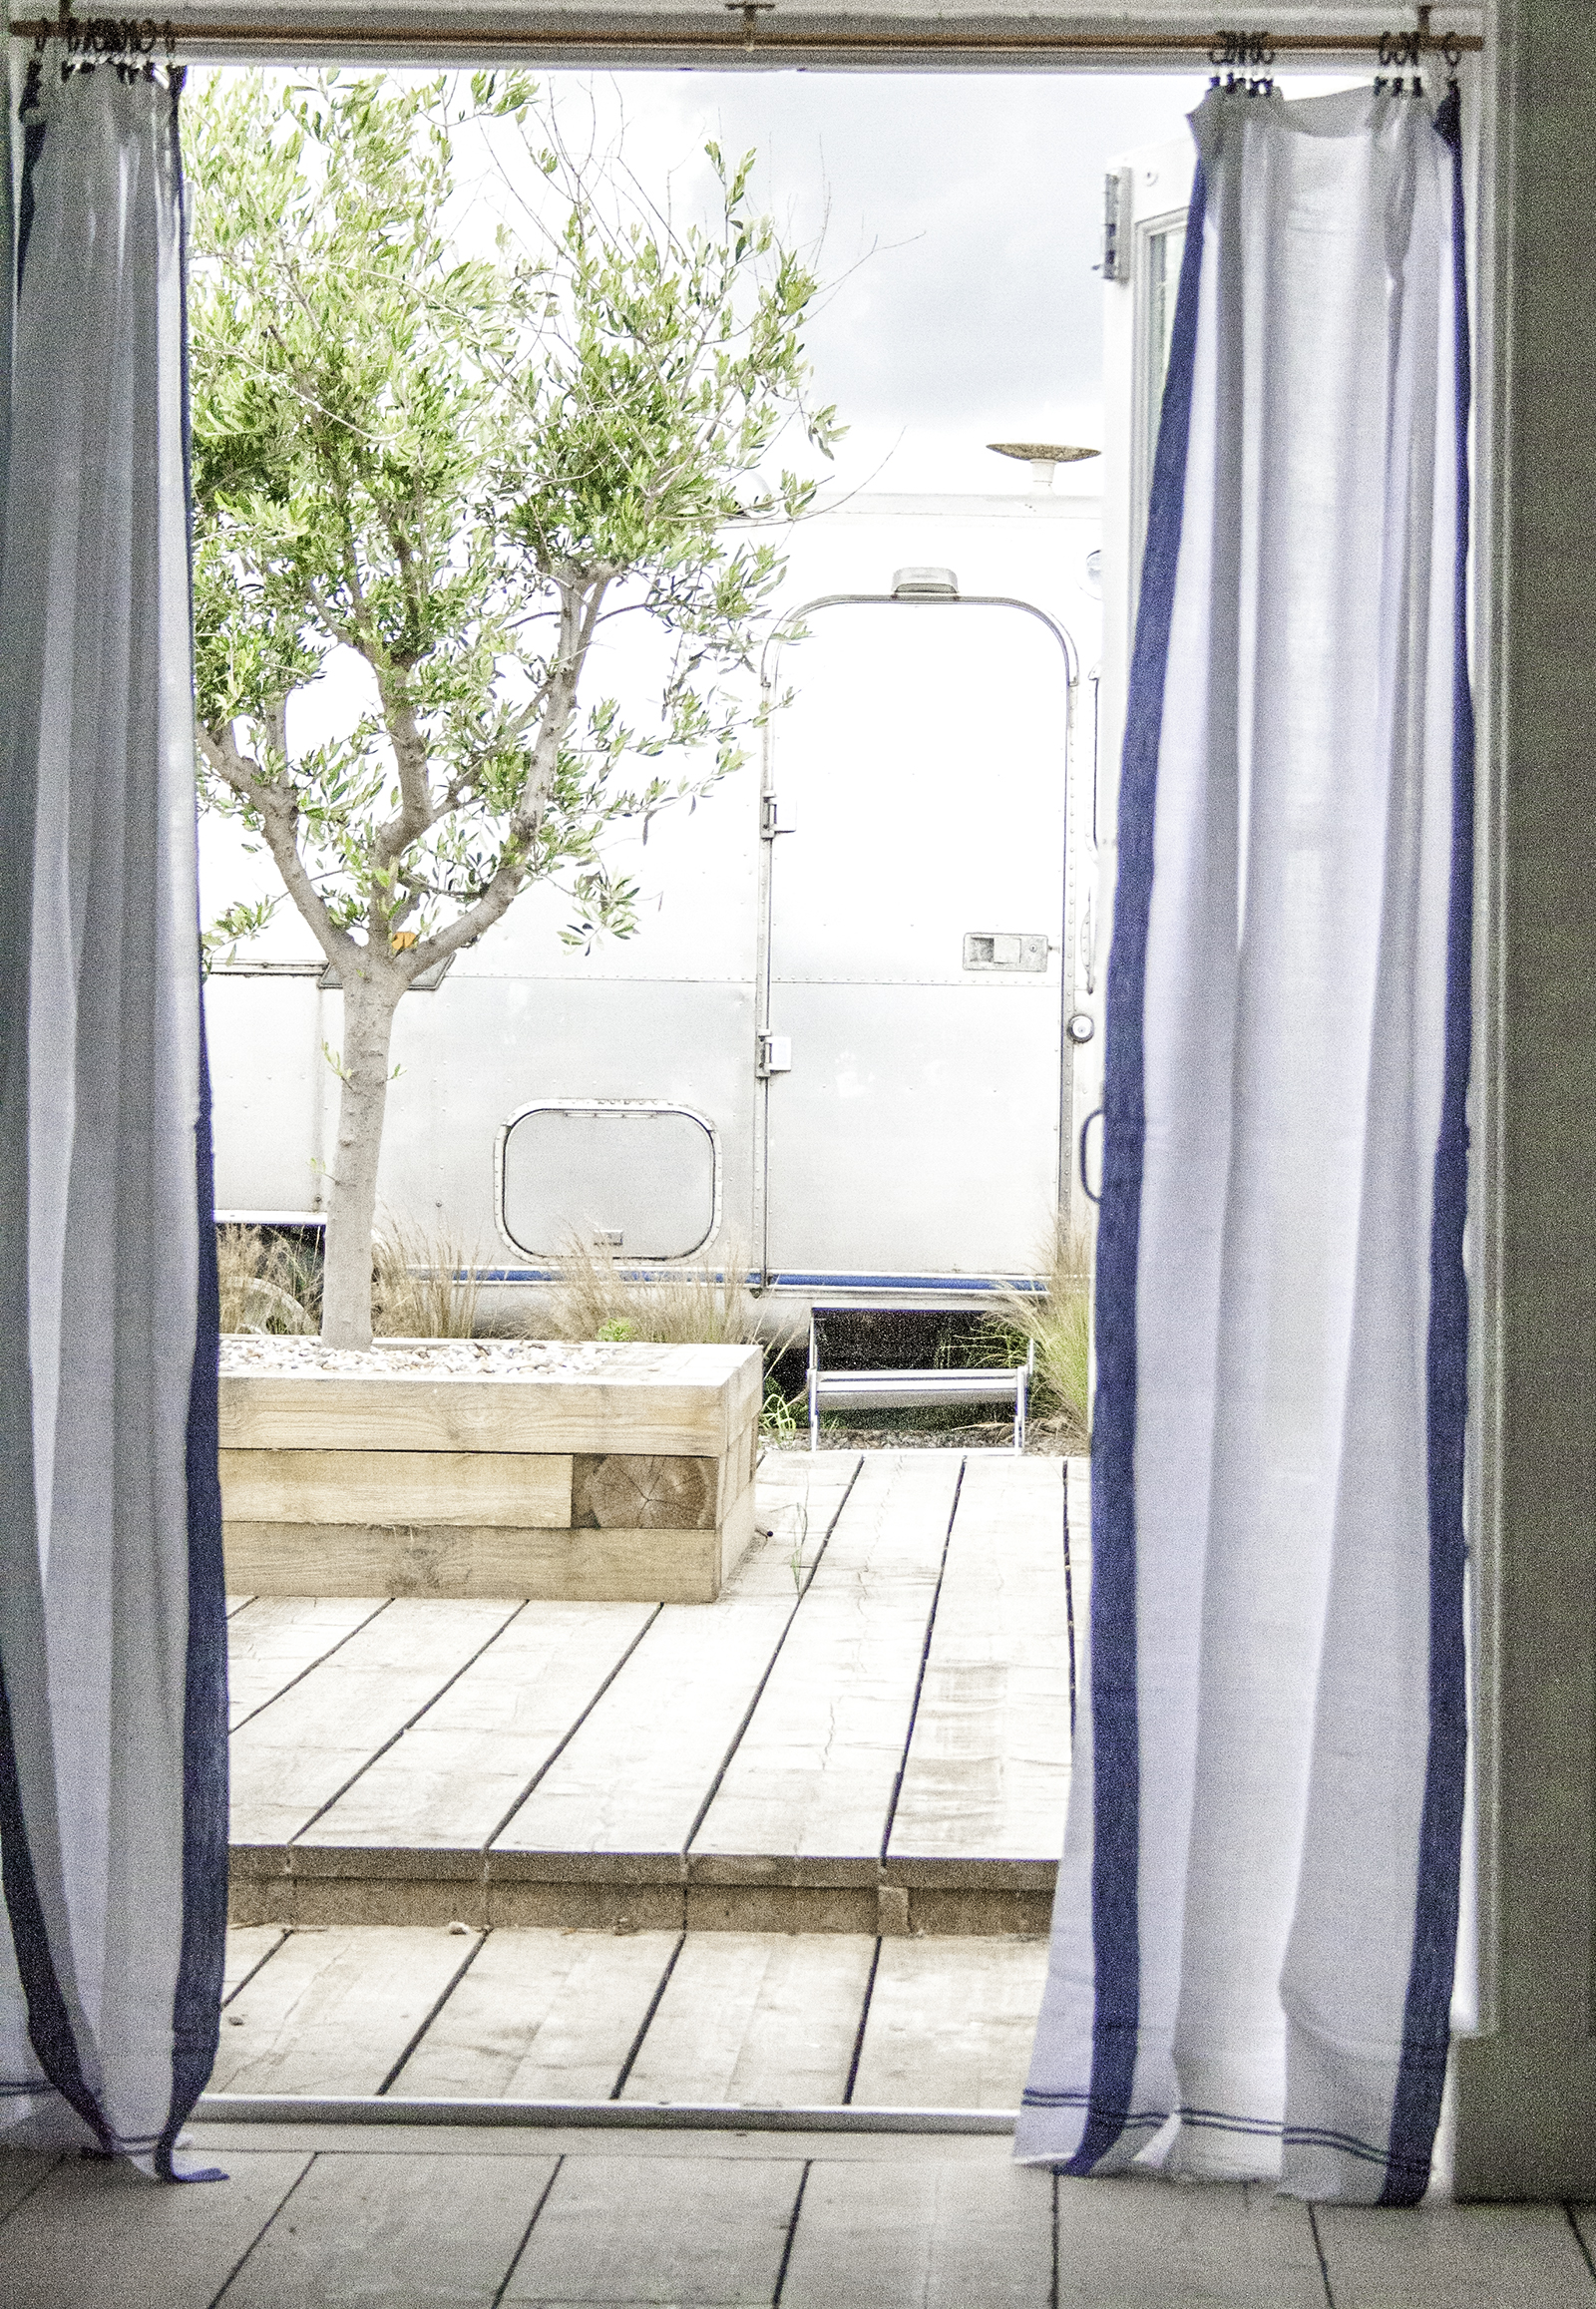 Curtains & Airstream